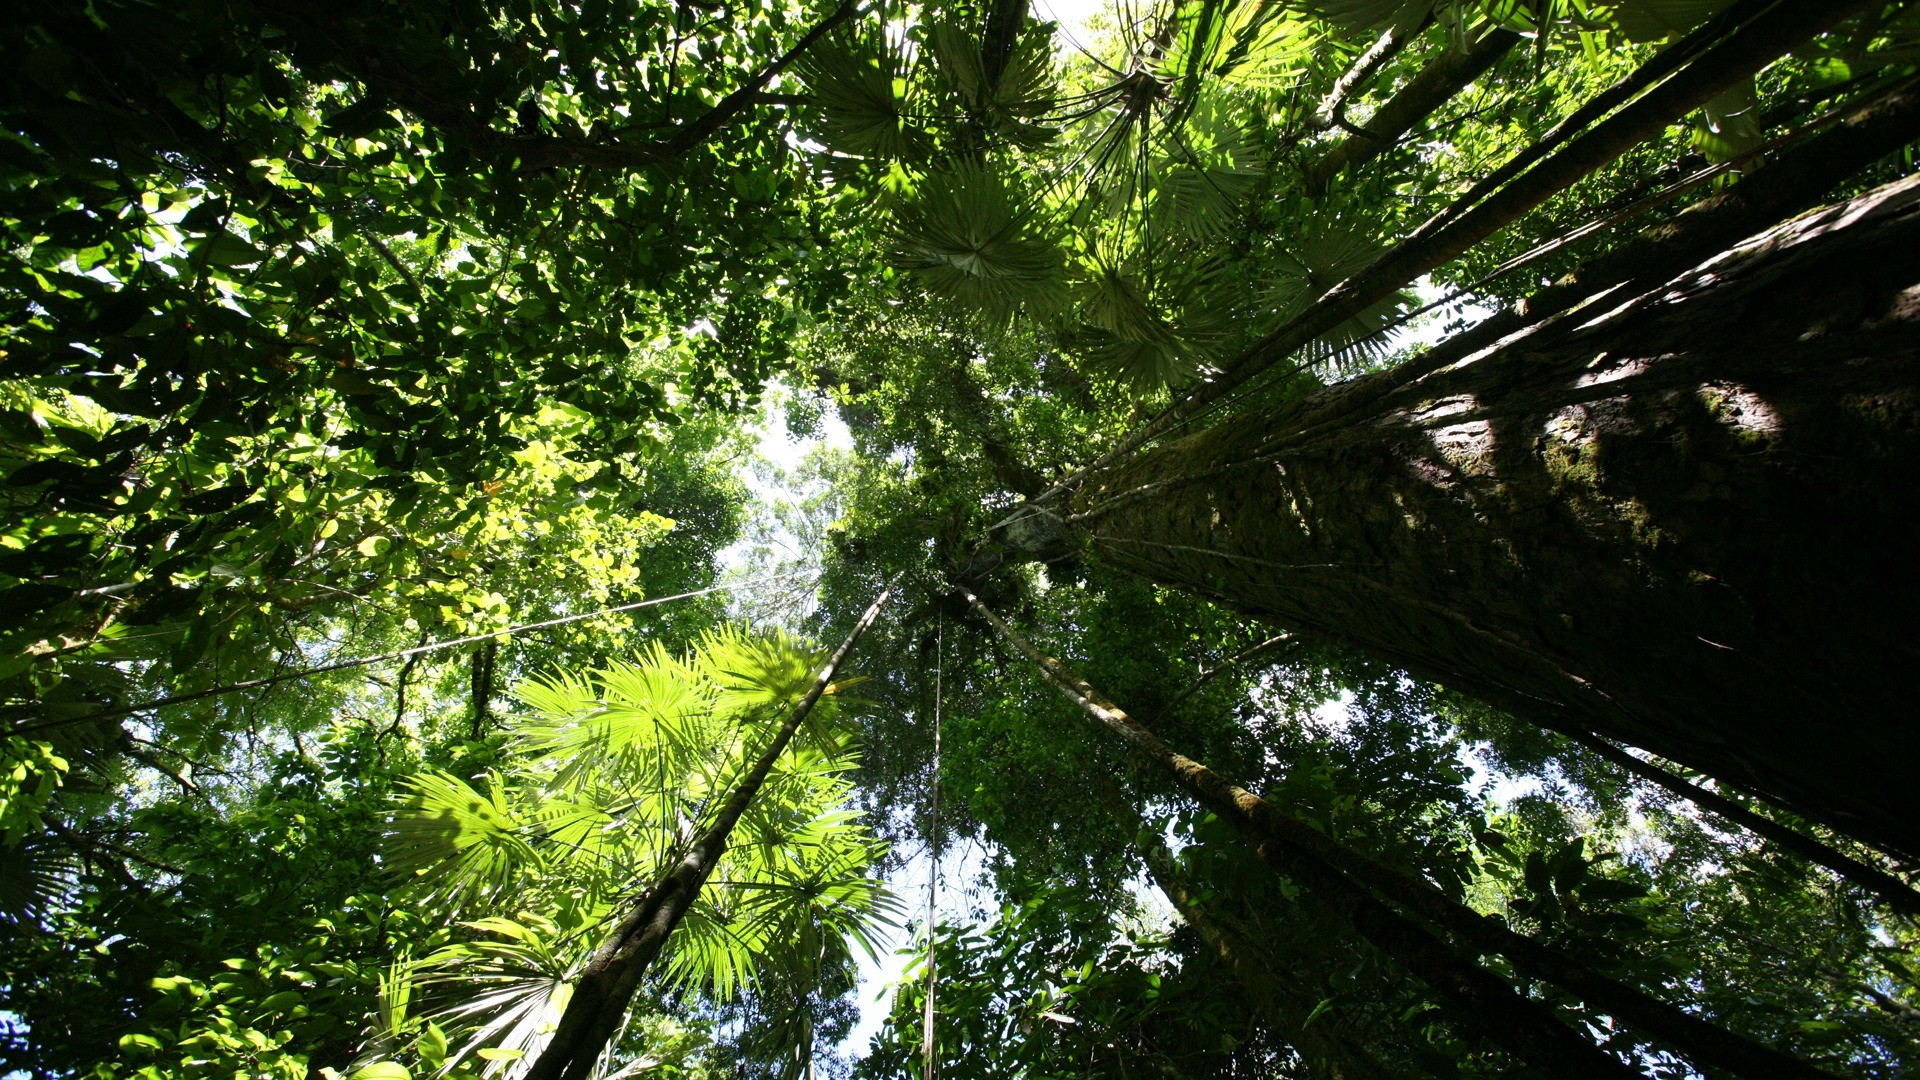 Rainforest canopy Wallpaper Plants Nature Wallpapers